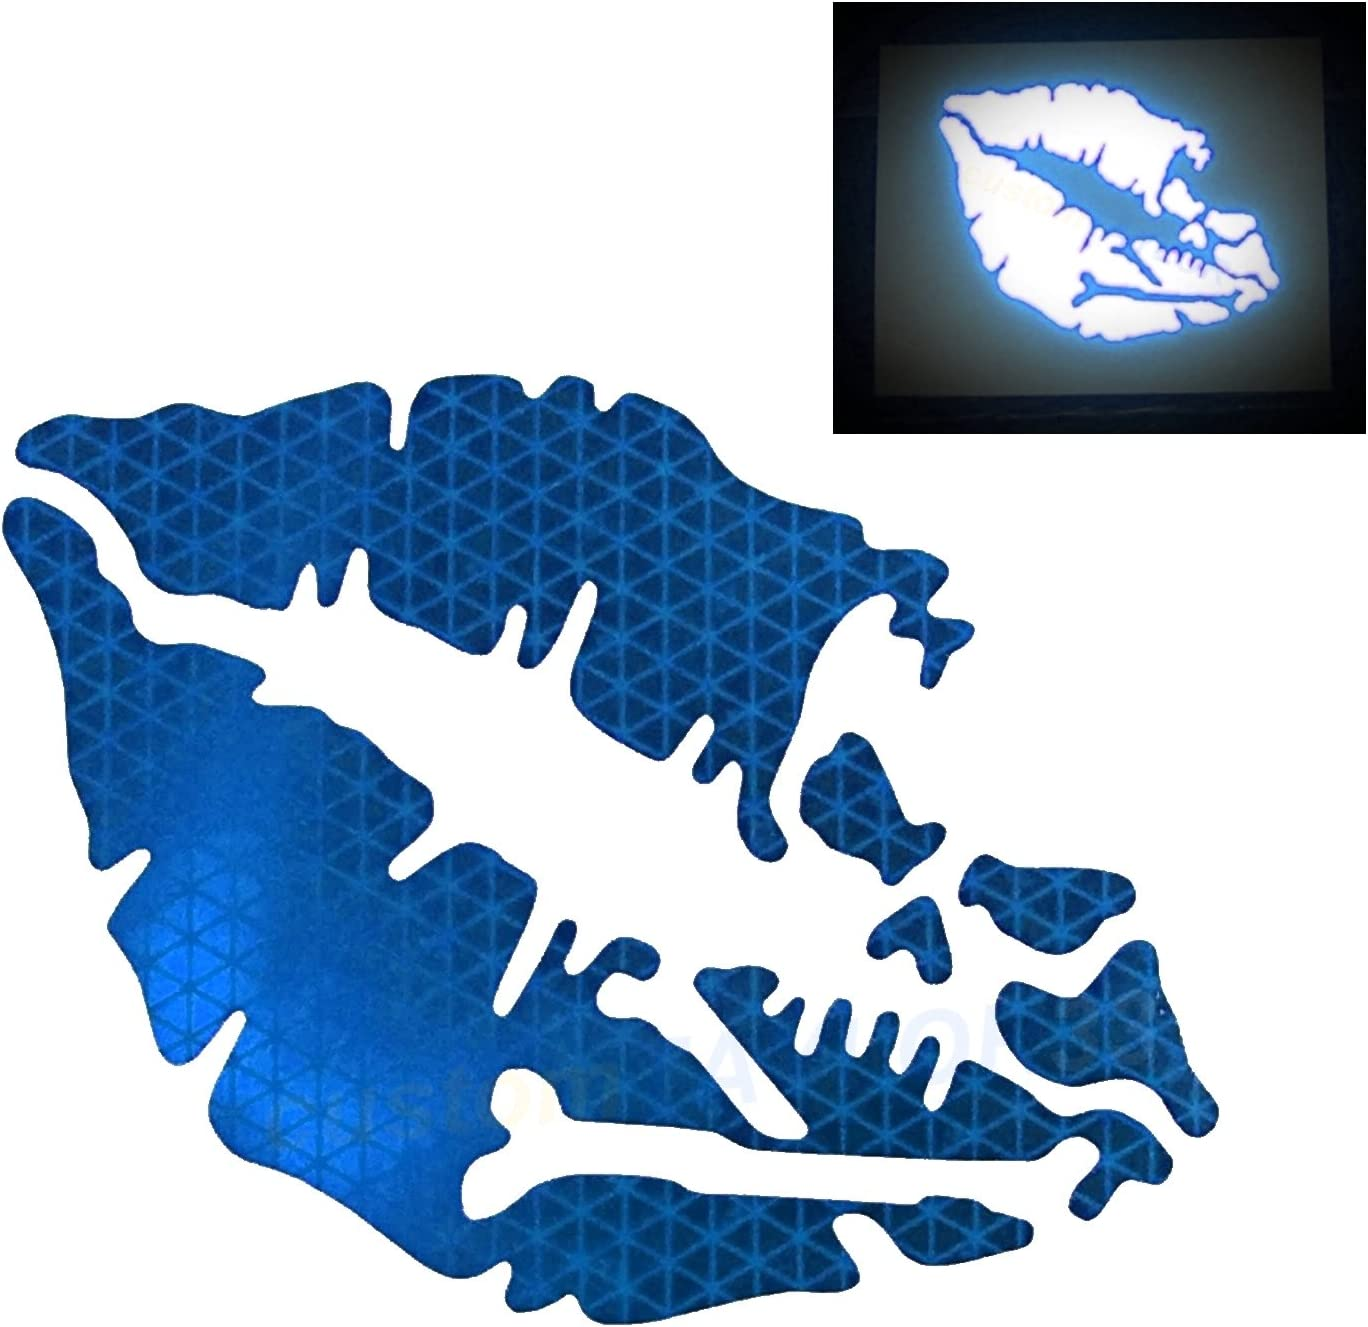 customTAYLOR33 High Intensity Reflective Vinyl Death Kiss Skull Crossbones Lips Decal Bumper Sticker - Cars, Motorcycles, Helmets, Wind Screens, laptops, cellphones, (Blue, 3 inch Wide, Pair)